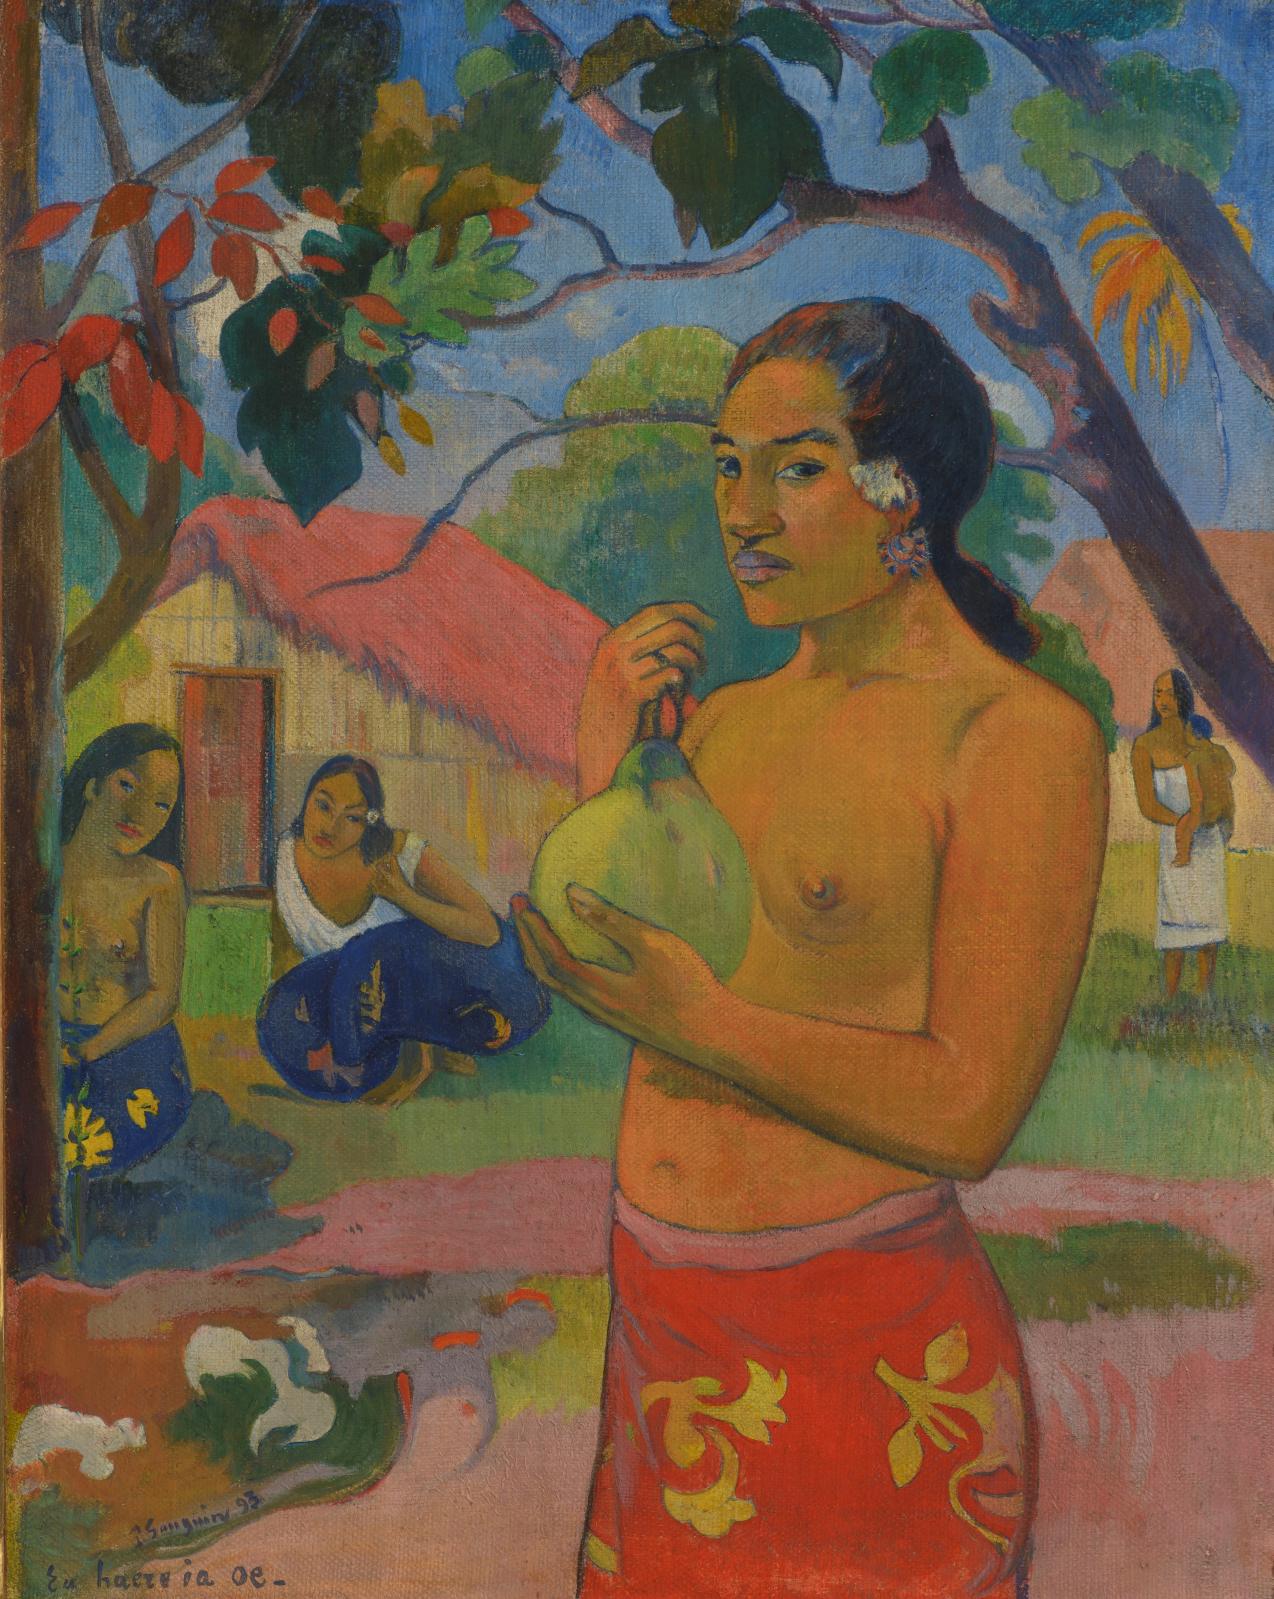 Paul Gauguin (1848-1903), Eu haere ia oe (Where are you?), Woman Holding a Fruit, 1893, oil on canvas, 92.5 x 73.5 cm/36.41 x 28.93 in.Sta